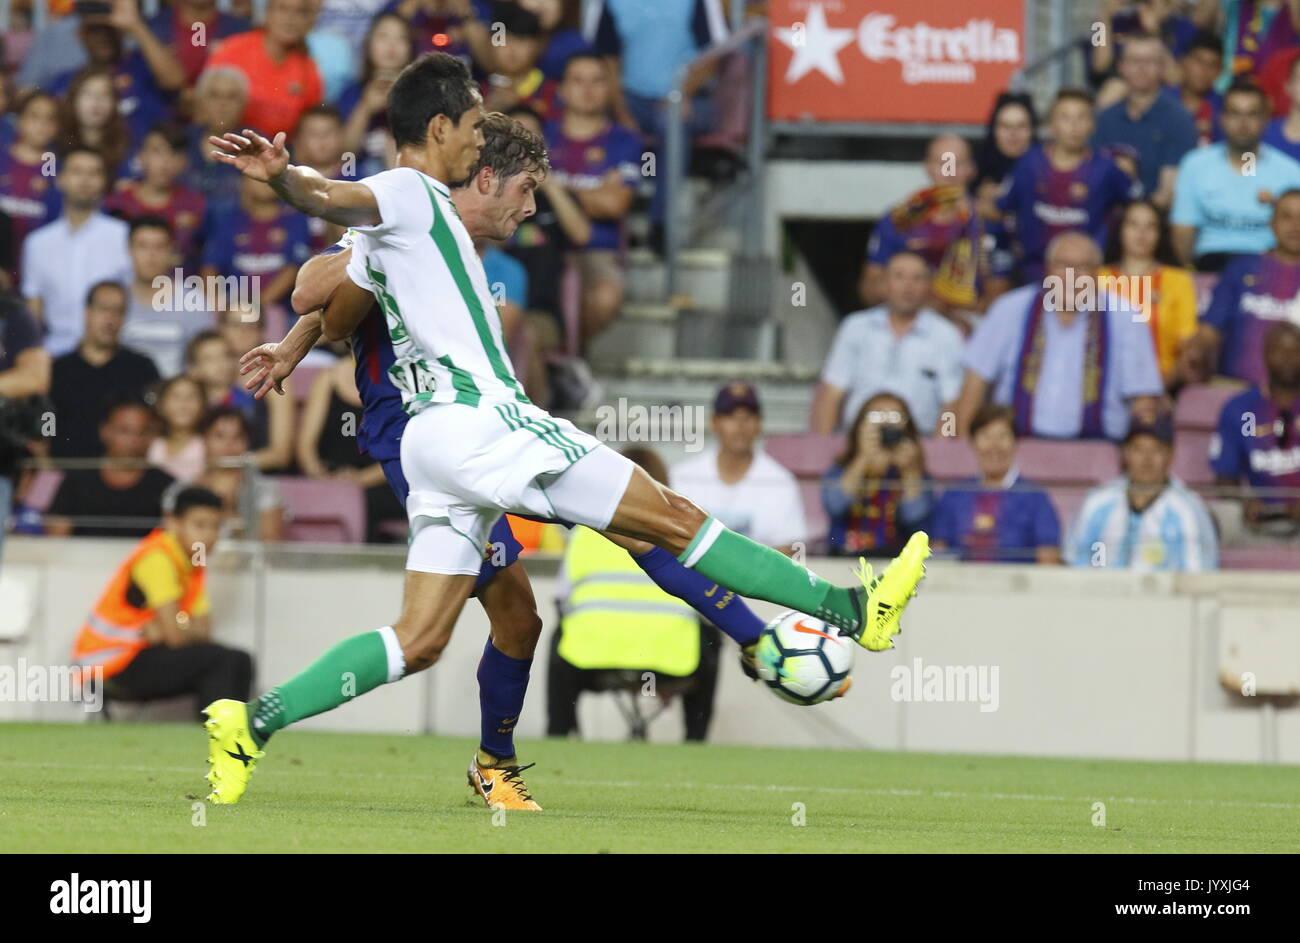 Sergi Roberto in action during La Liga game between FC Barcelona v Betis at Camp Nou - Stock Image